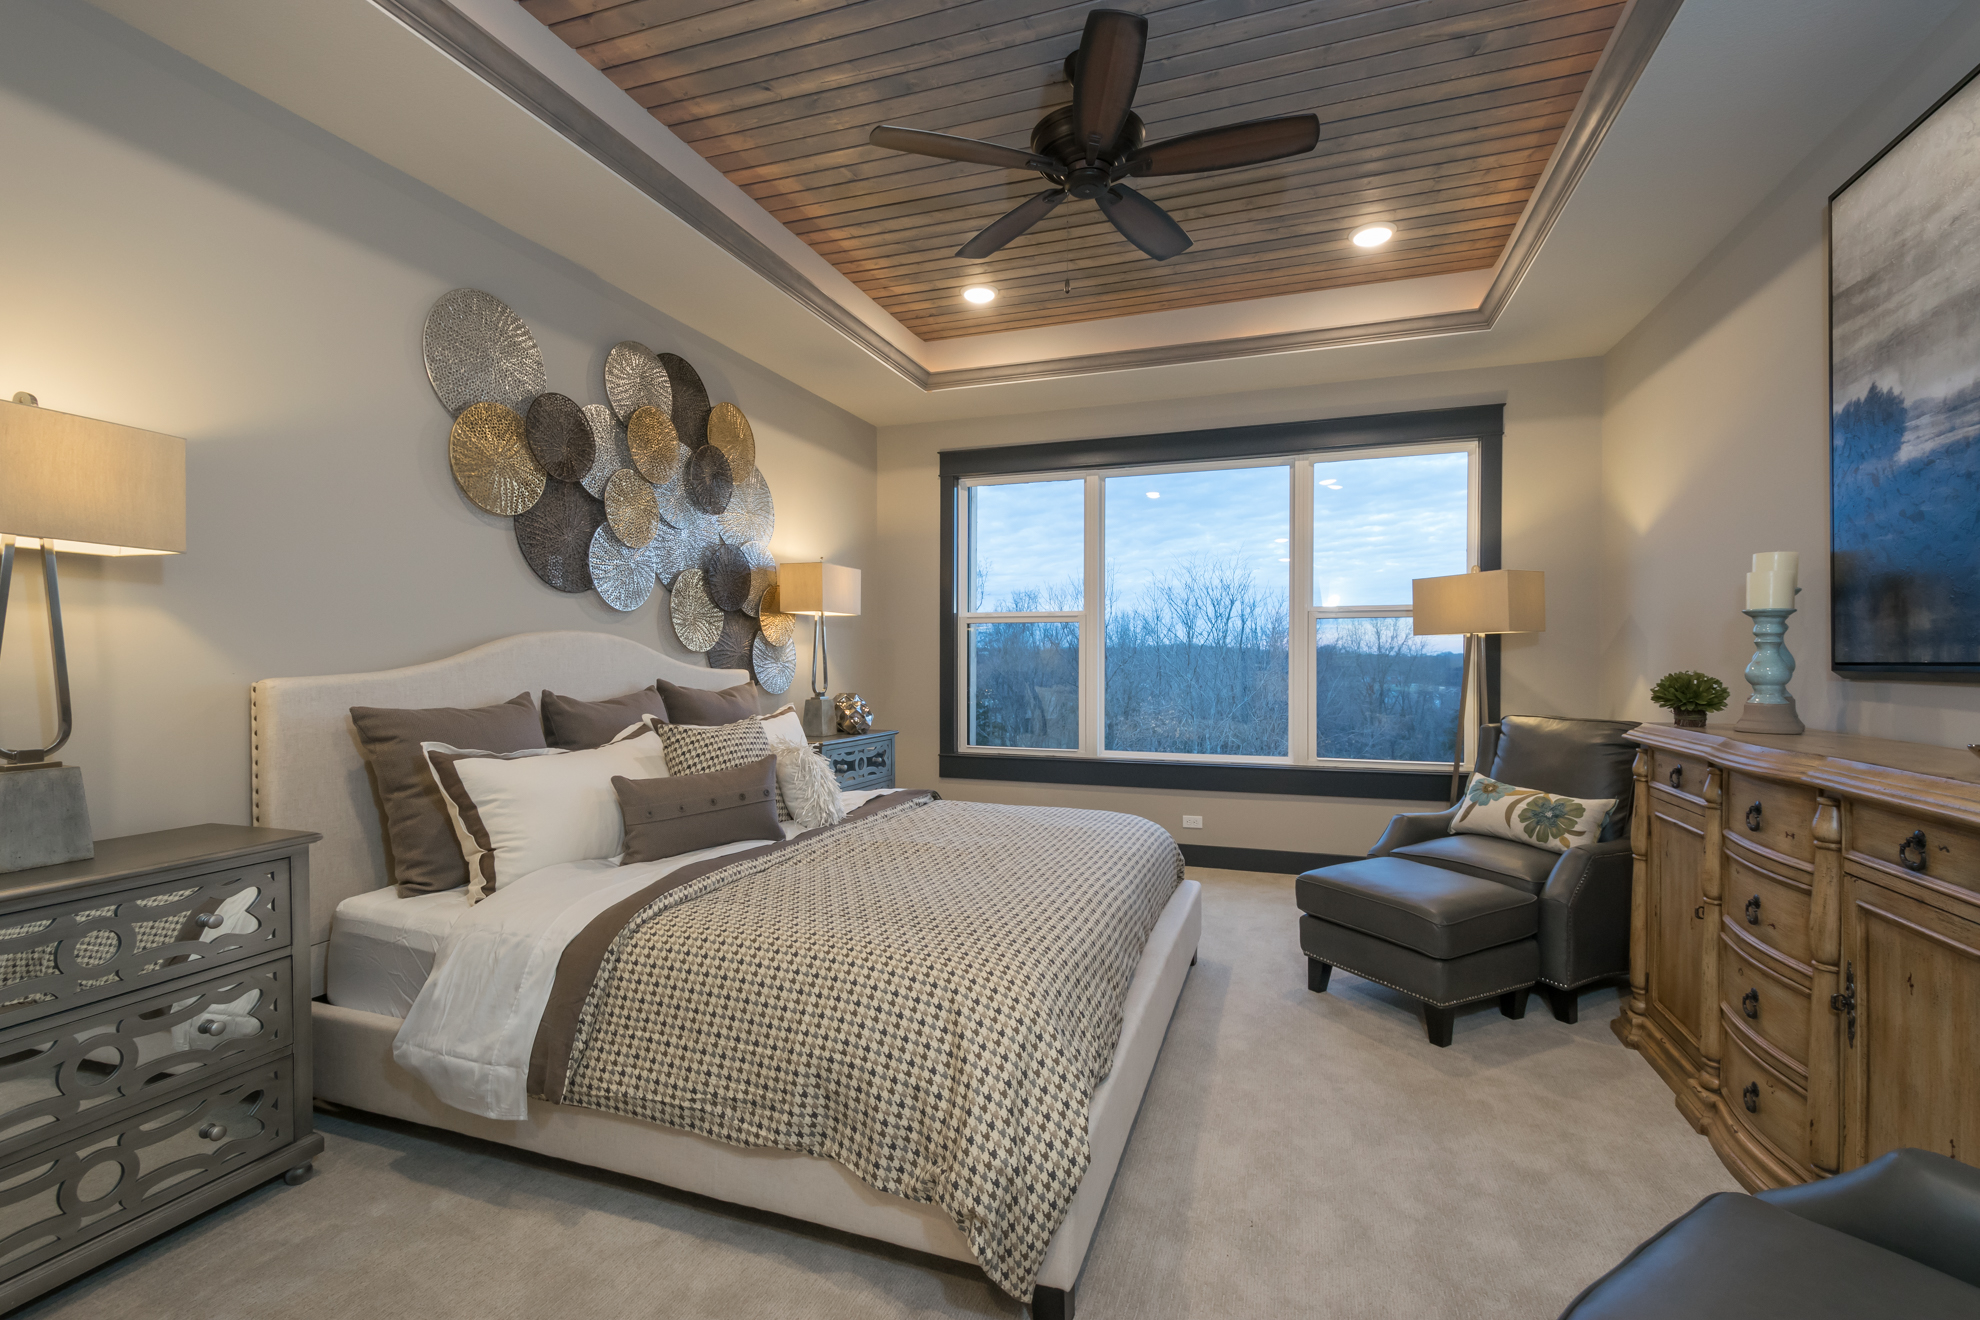 New Home Bedroom Columbia MO